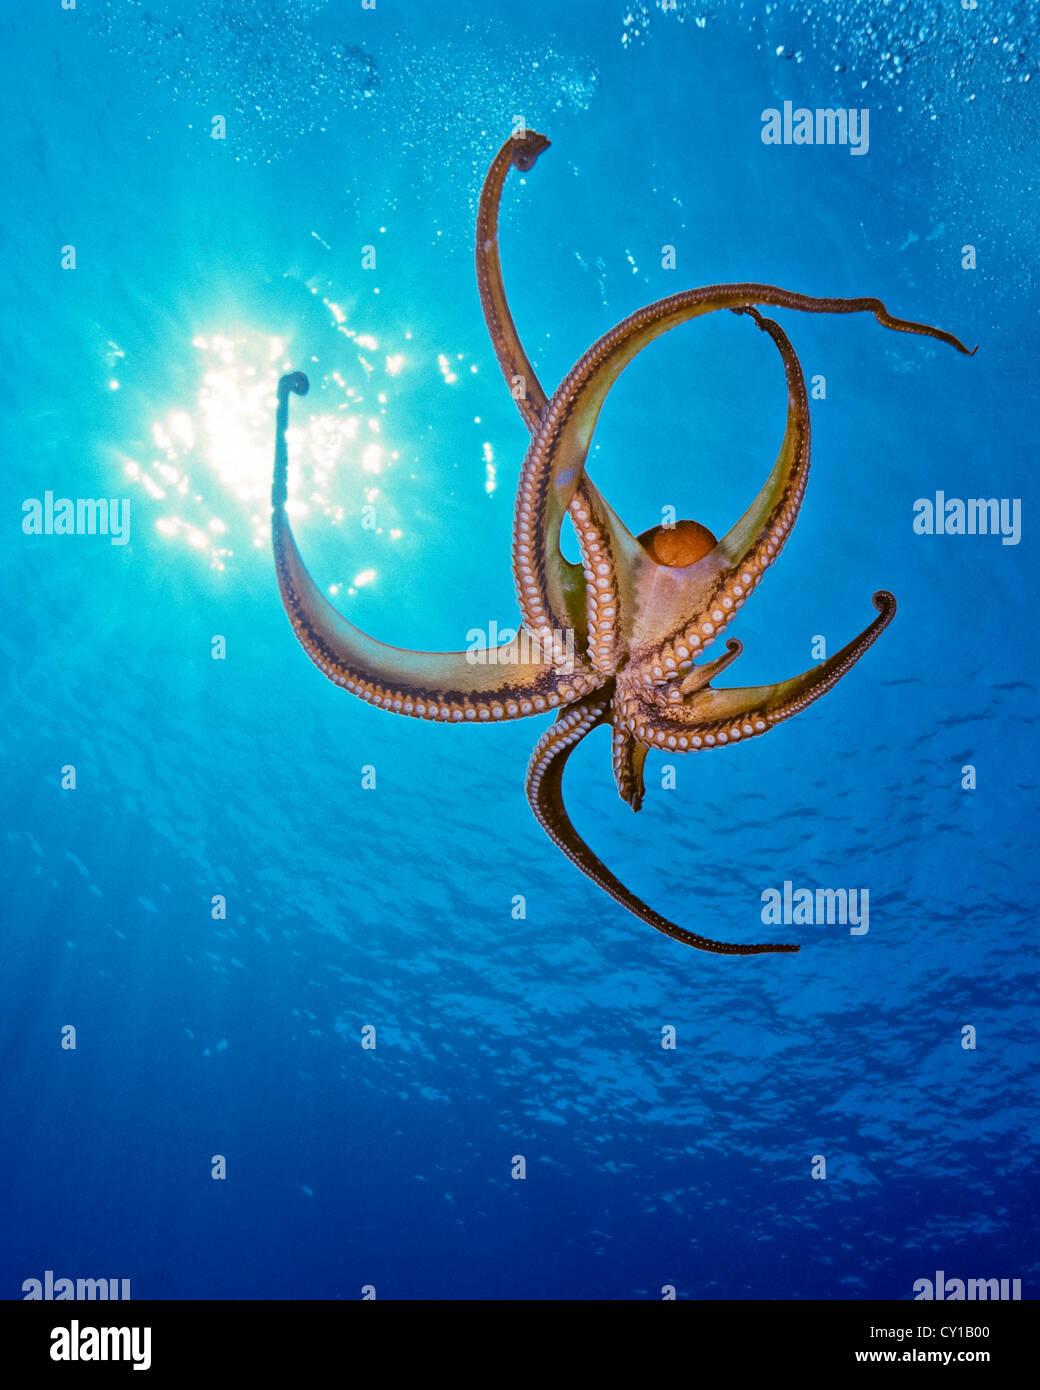 Giorno di polpo, Octopus cyanea, Big Island, Hawaii, STATI UNITI D'AMERICA Immagini Stock